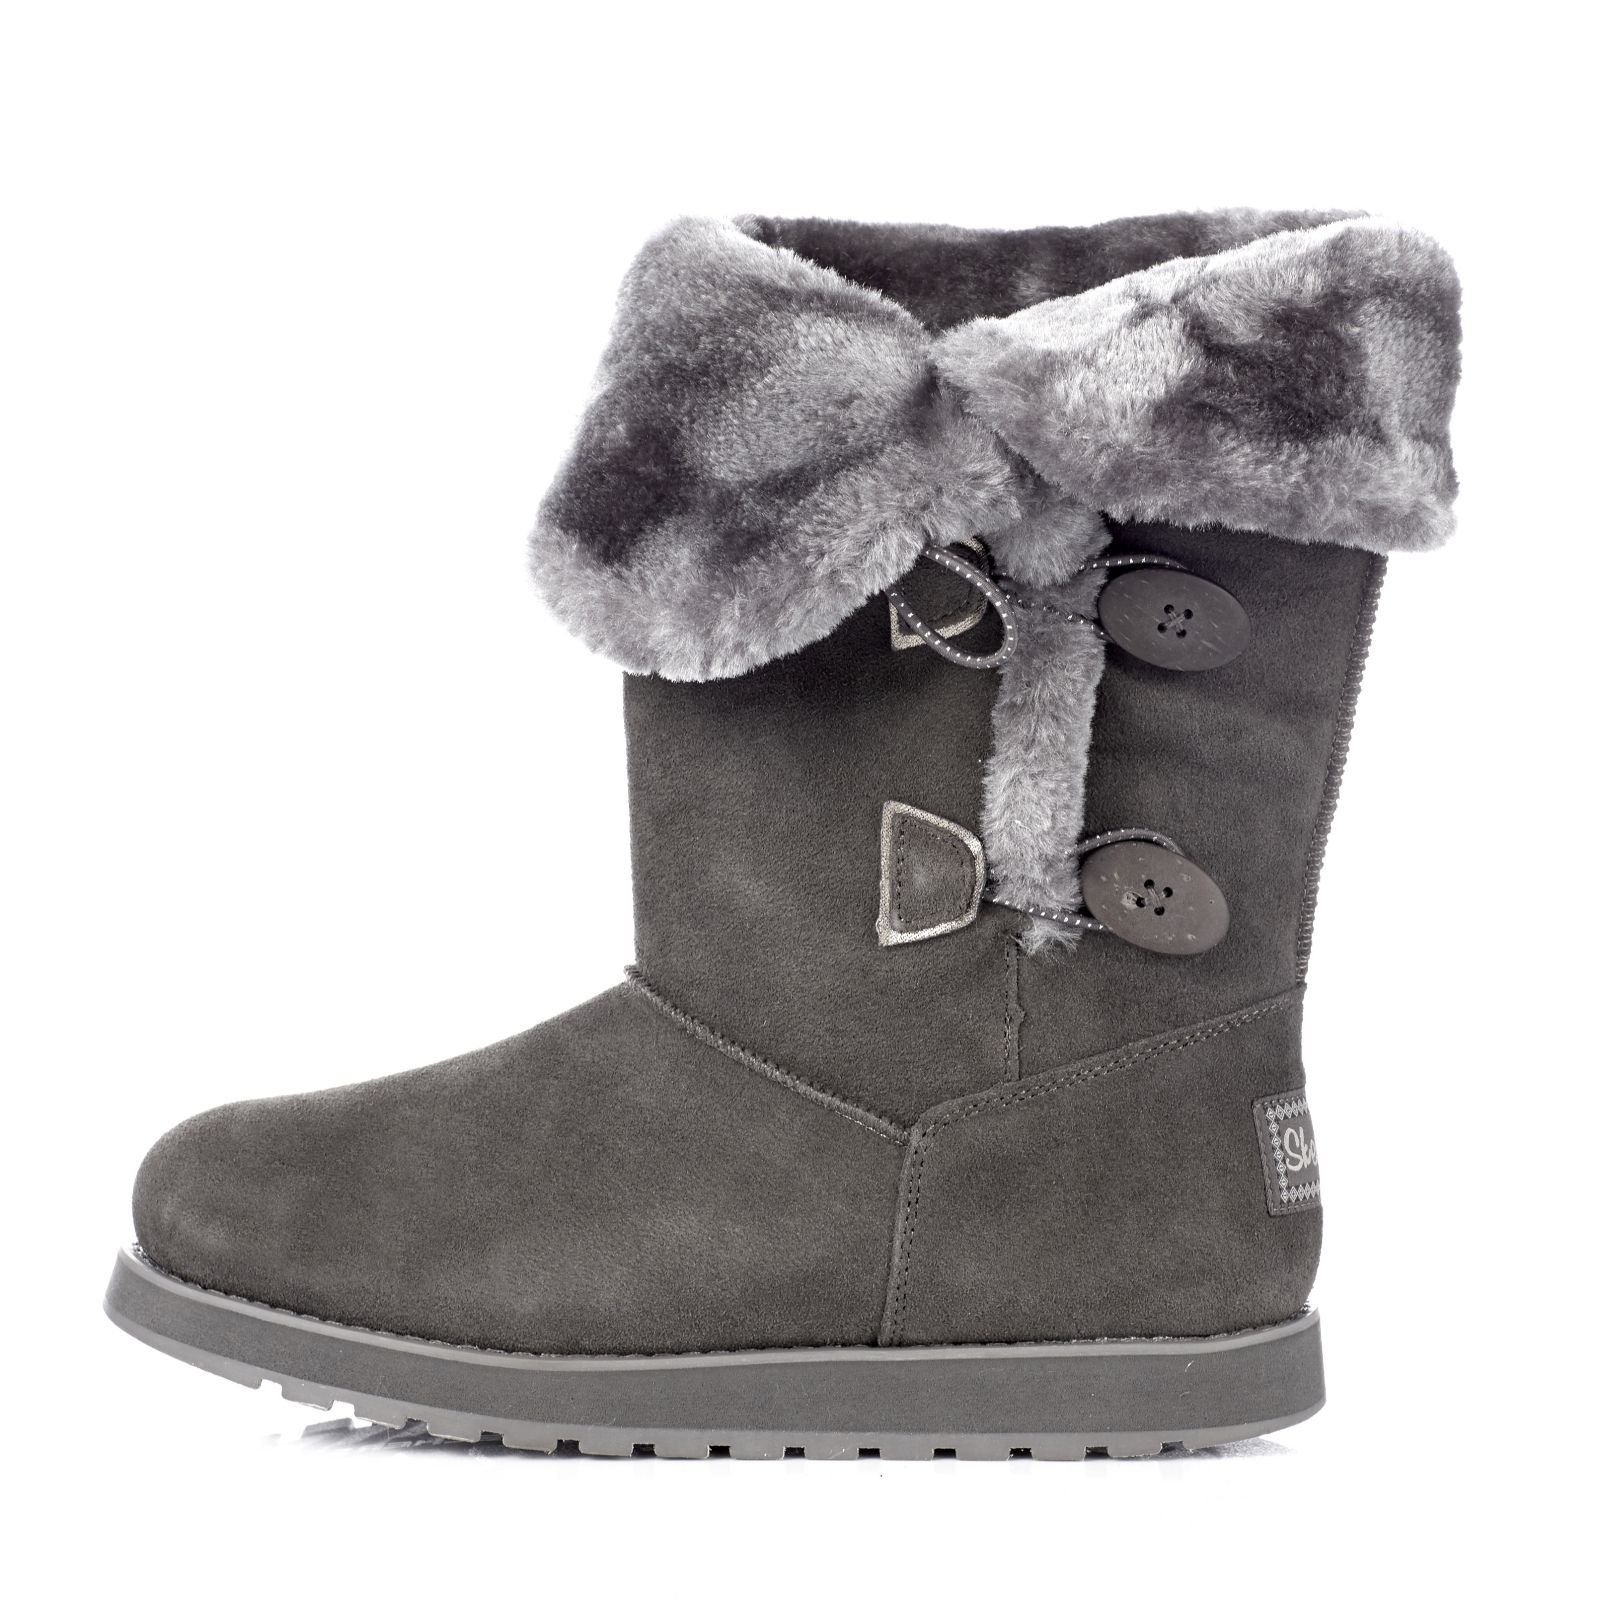 30d5ee7c026e Skechers Keepsakes Appeal Suede Boot with Faux Fur Trim   Memory Foam -  Page 1 - QVC UK